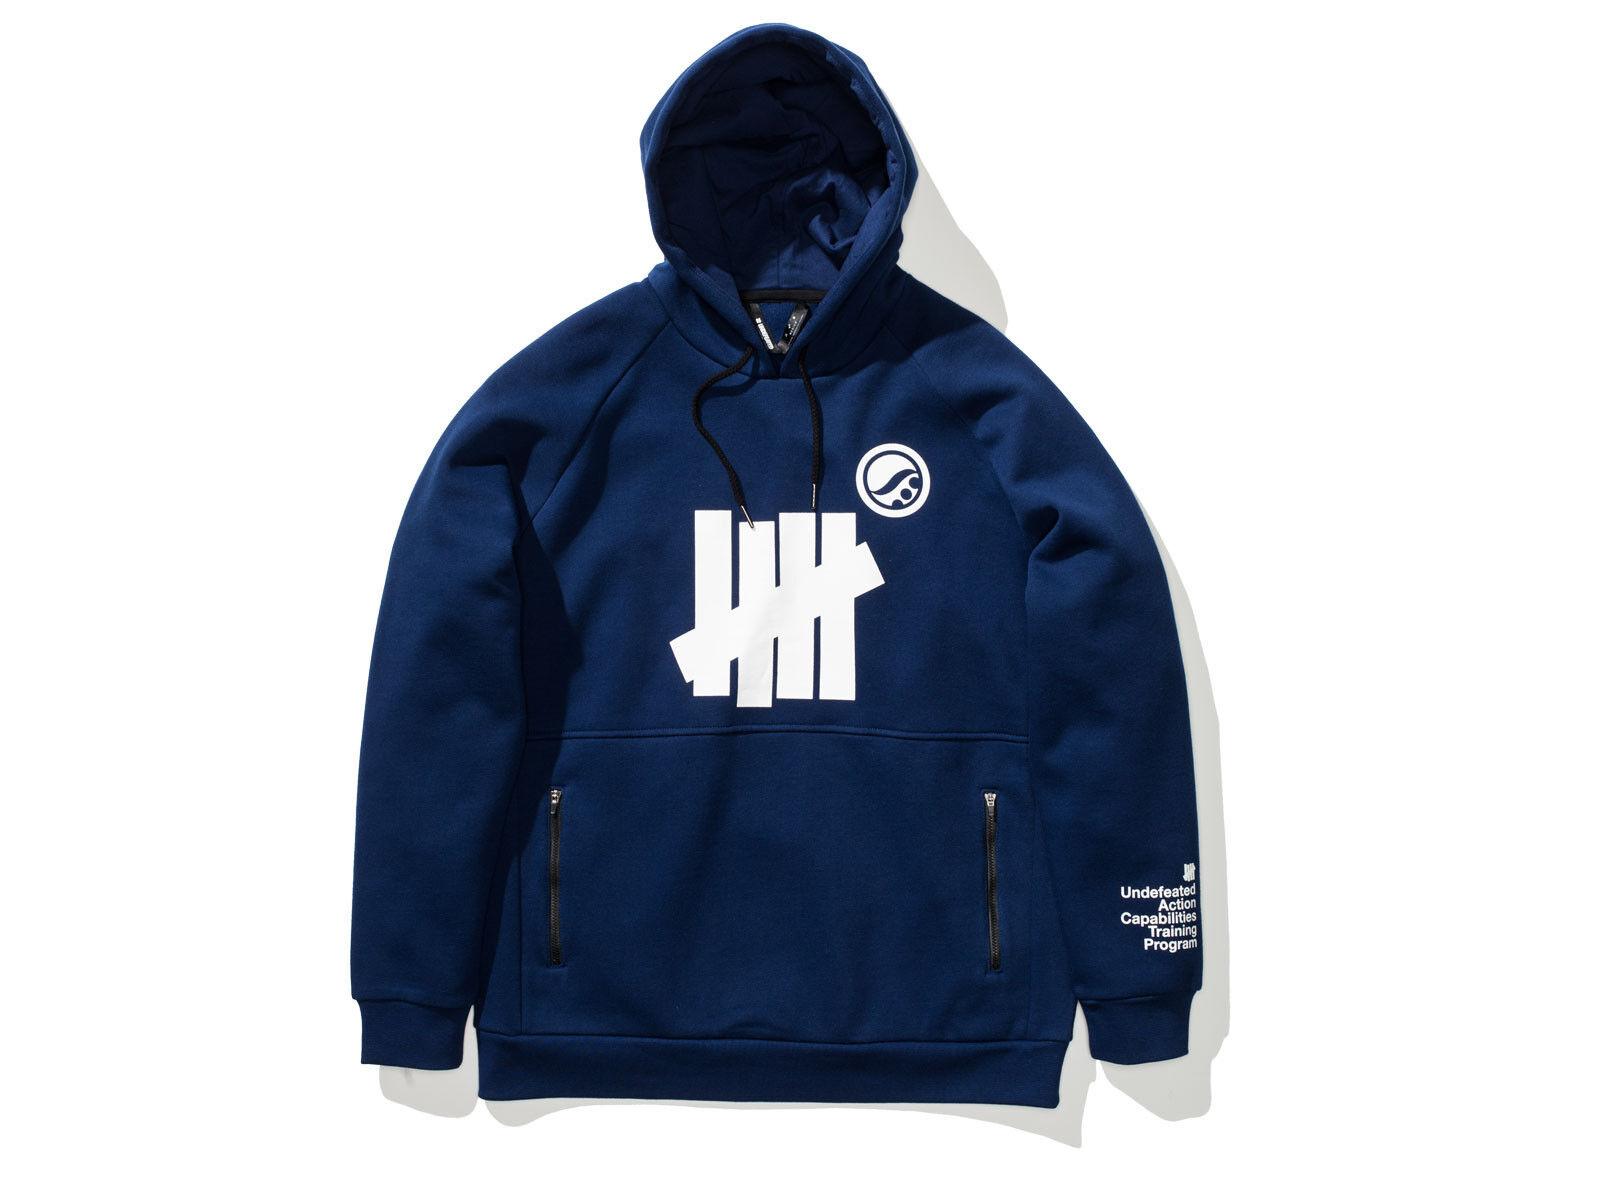 Shoygoldll x Undefeated Technical Hoodie Brand New hoody jiujitsu bjj syr